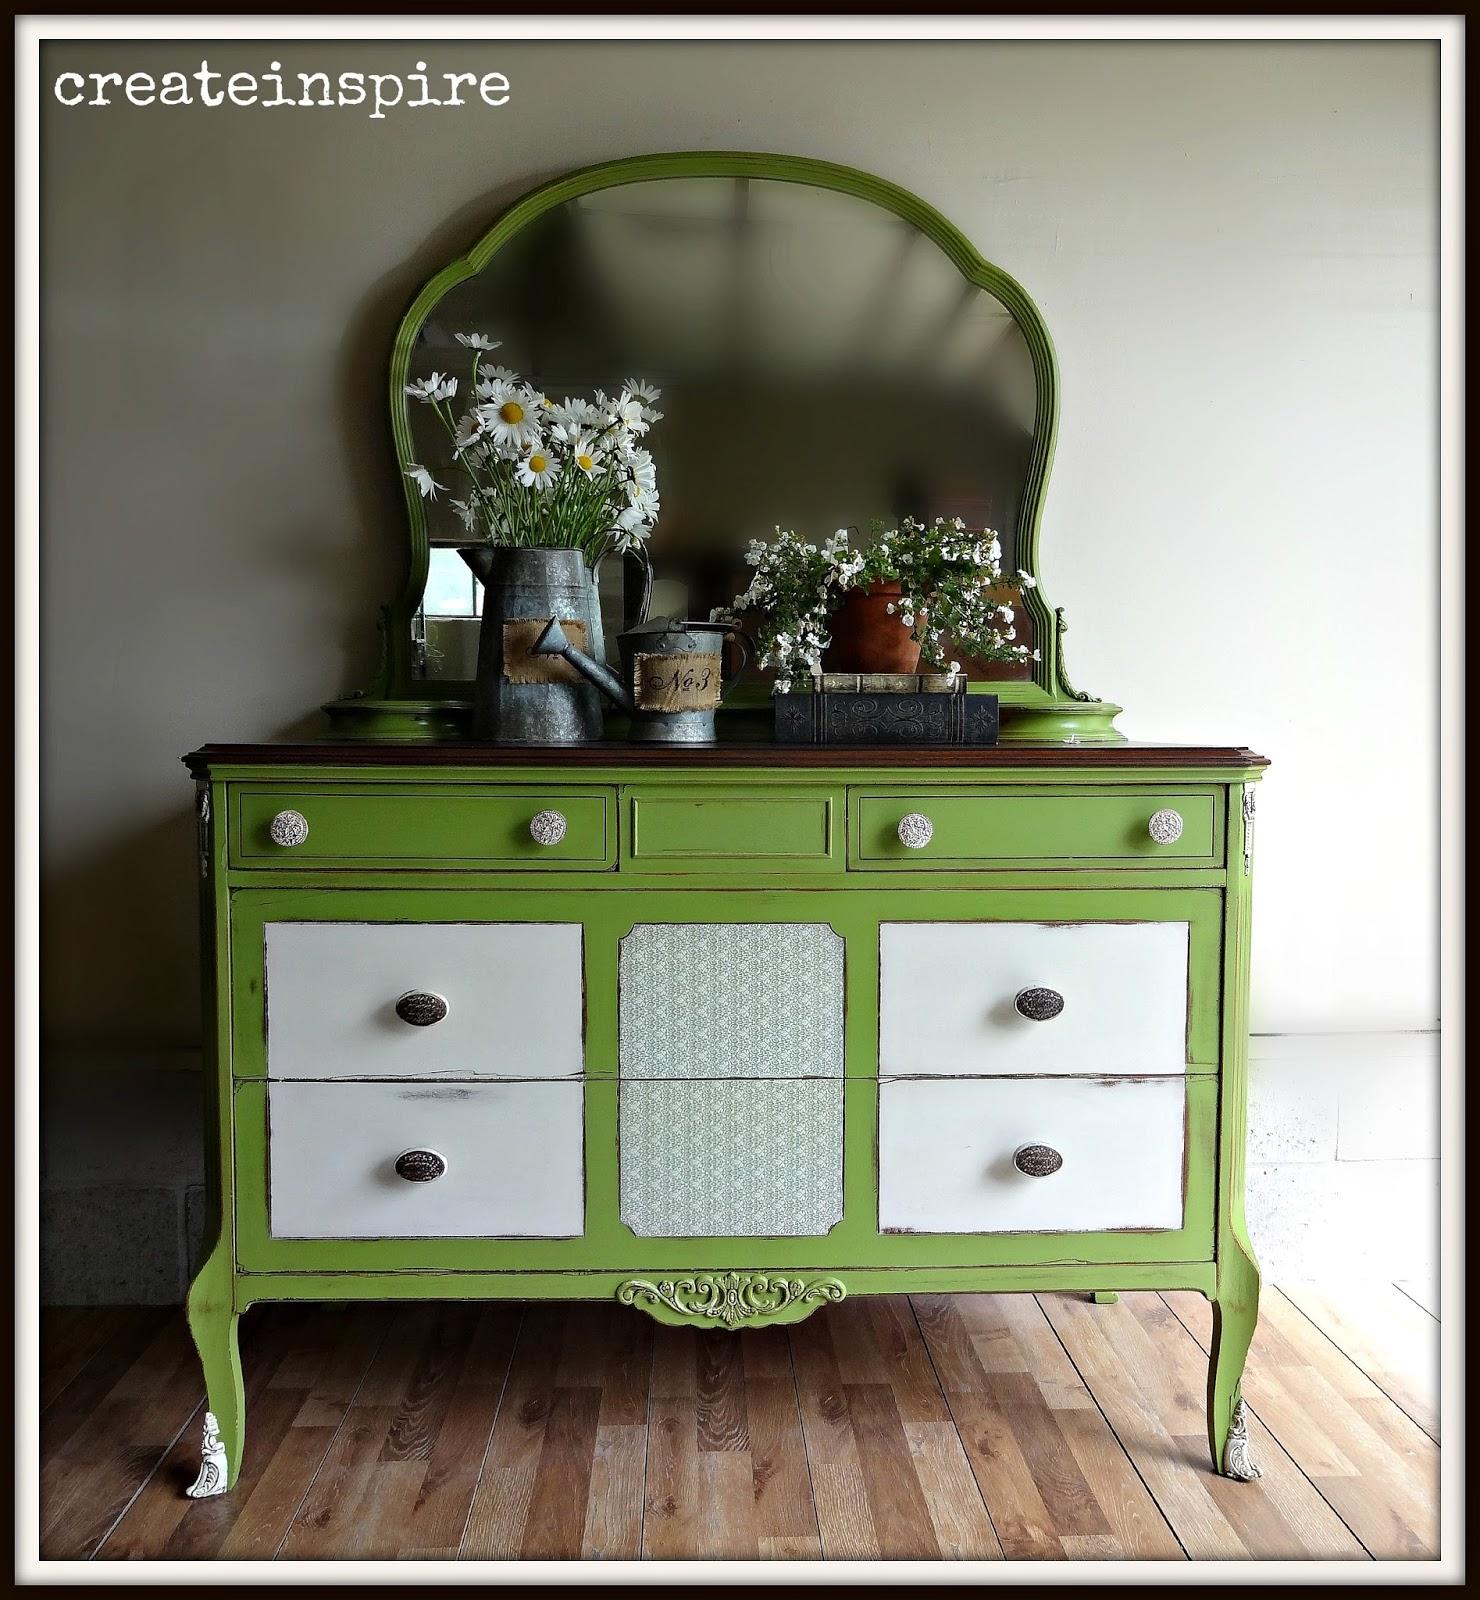 createinspire antique dresser with mirror. Black Bedroom Furniture Sets. Home Design Ideas